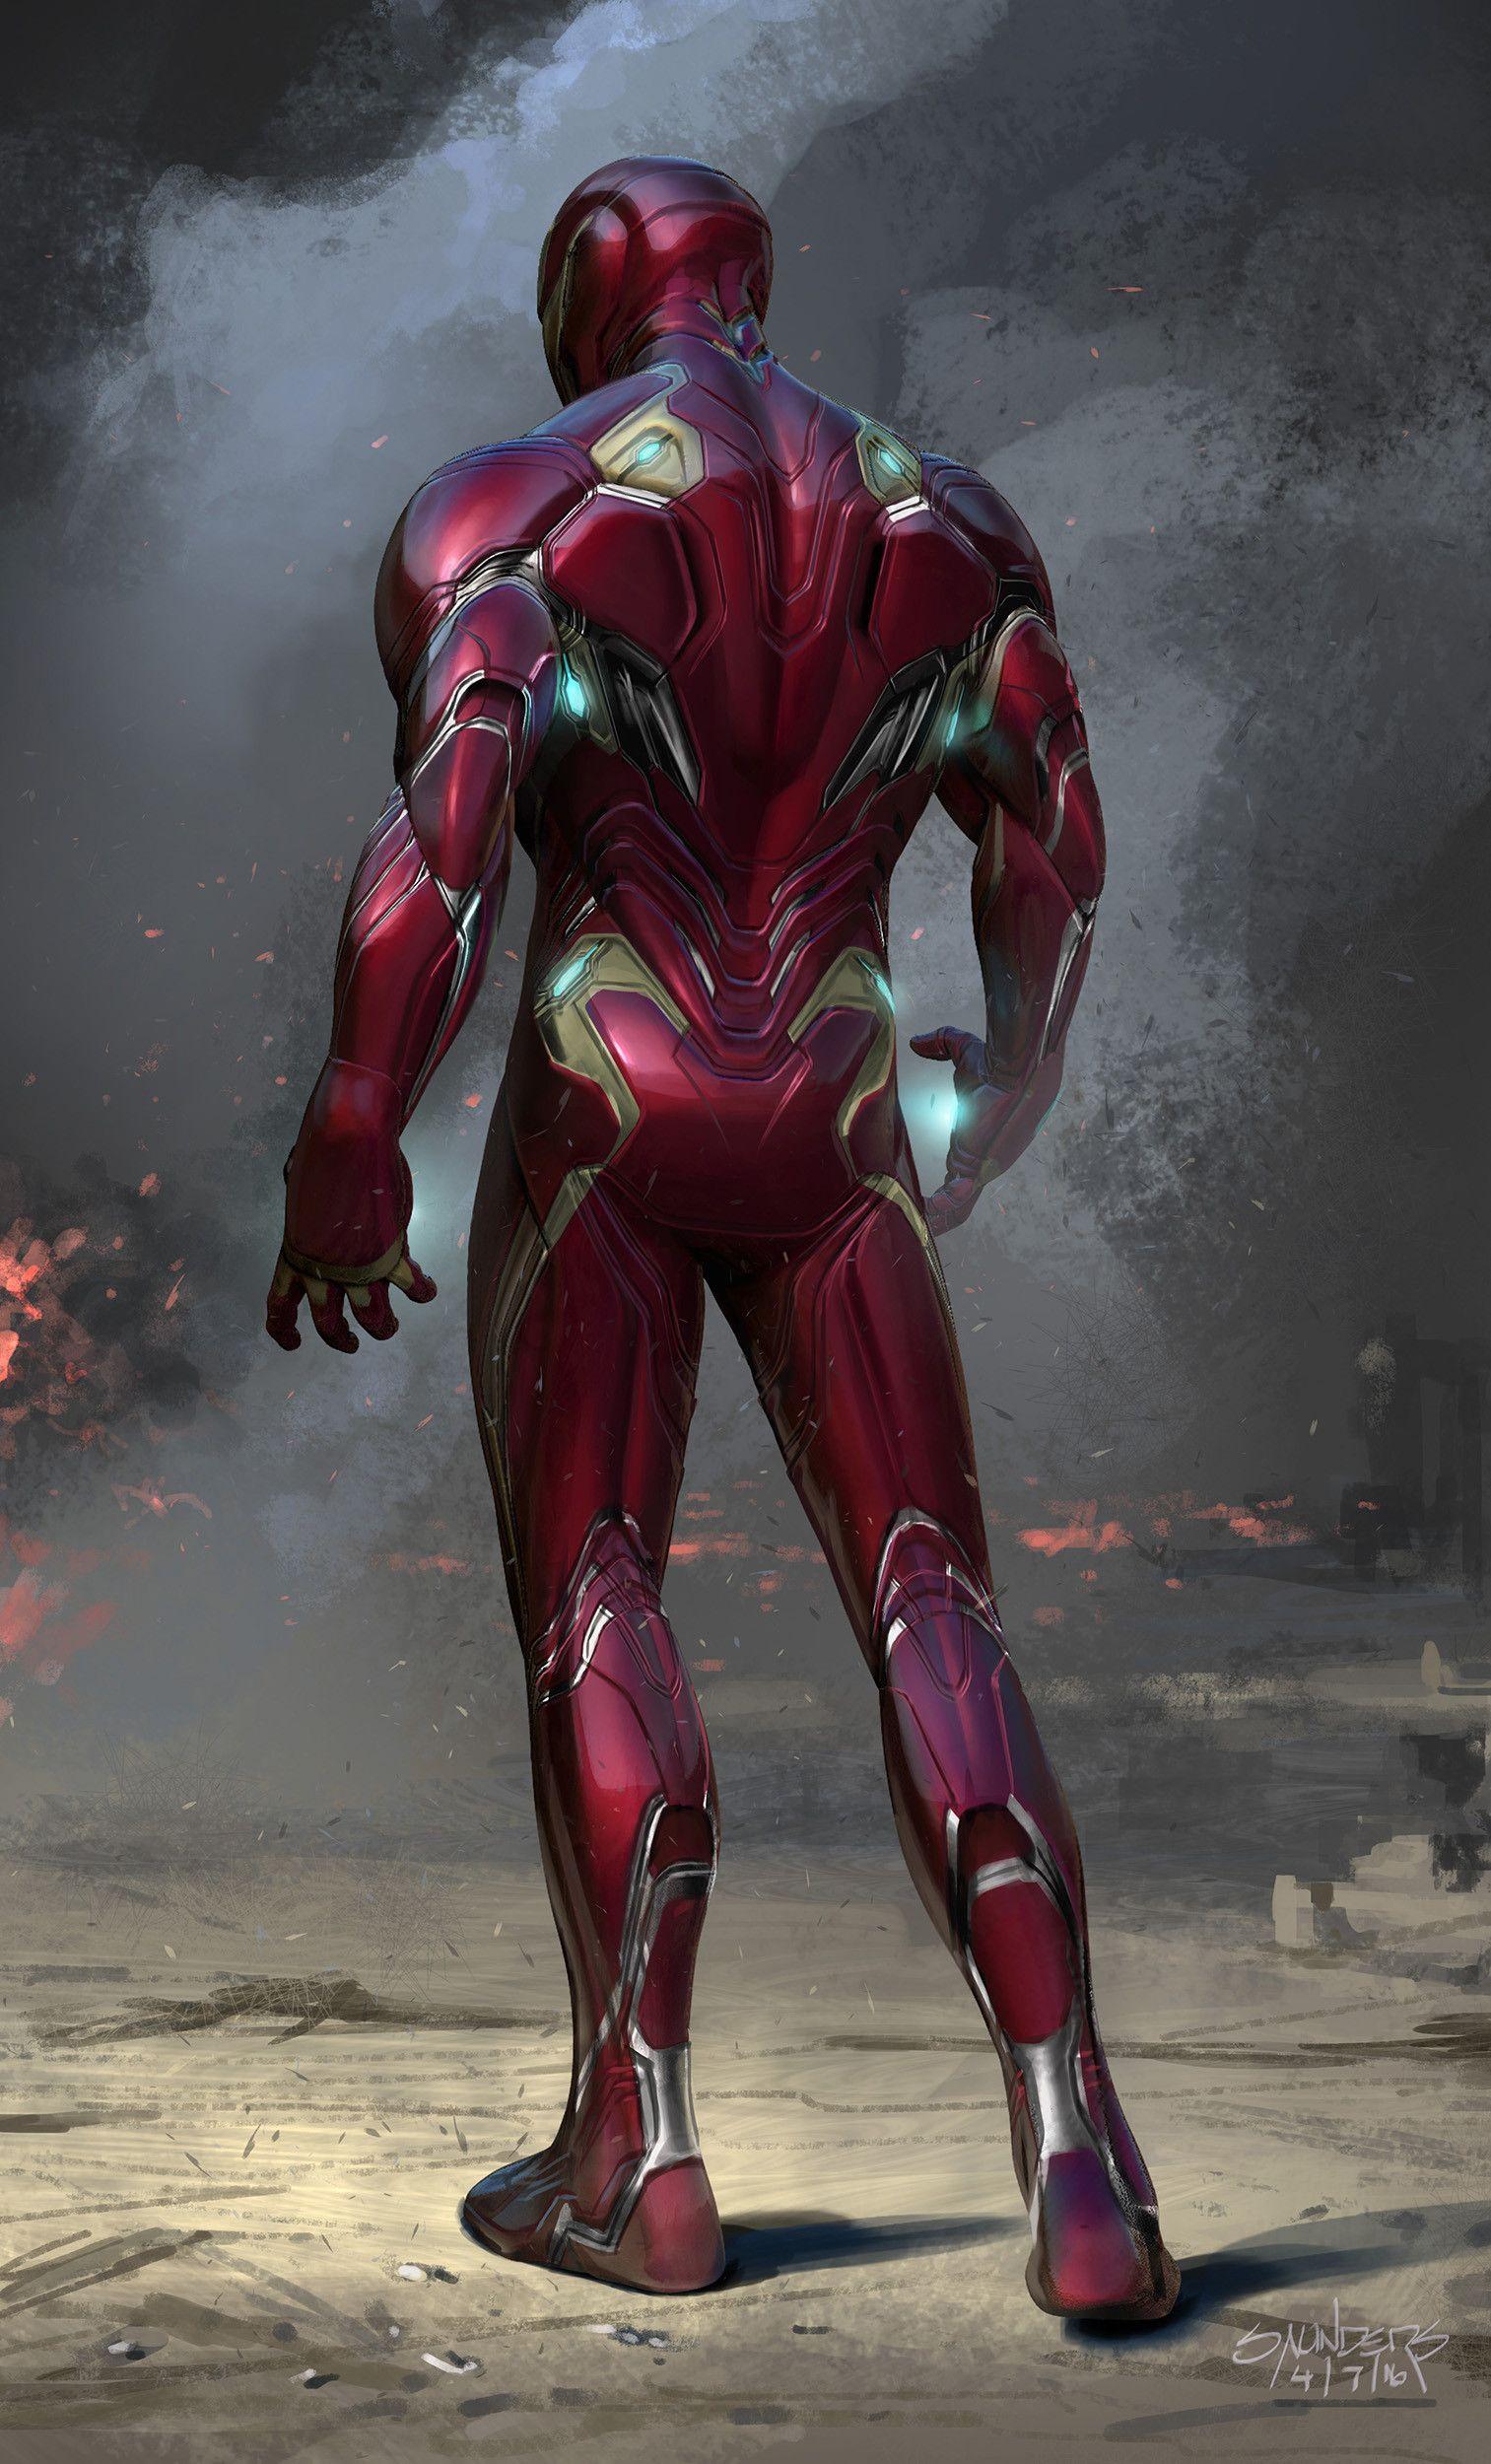 Artstation Avengers Infinity War 2016 Iron Man Mk 50 Final Front View Phil Saunders Iron Man Avengers Iron Man Wallpaper Iron Man Armor